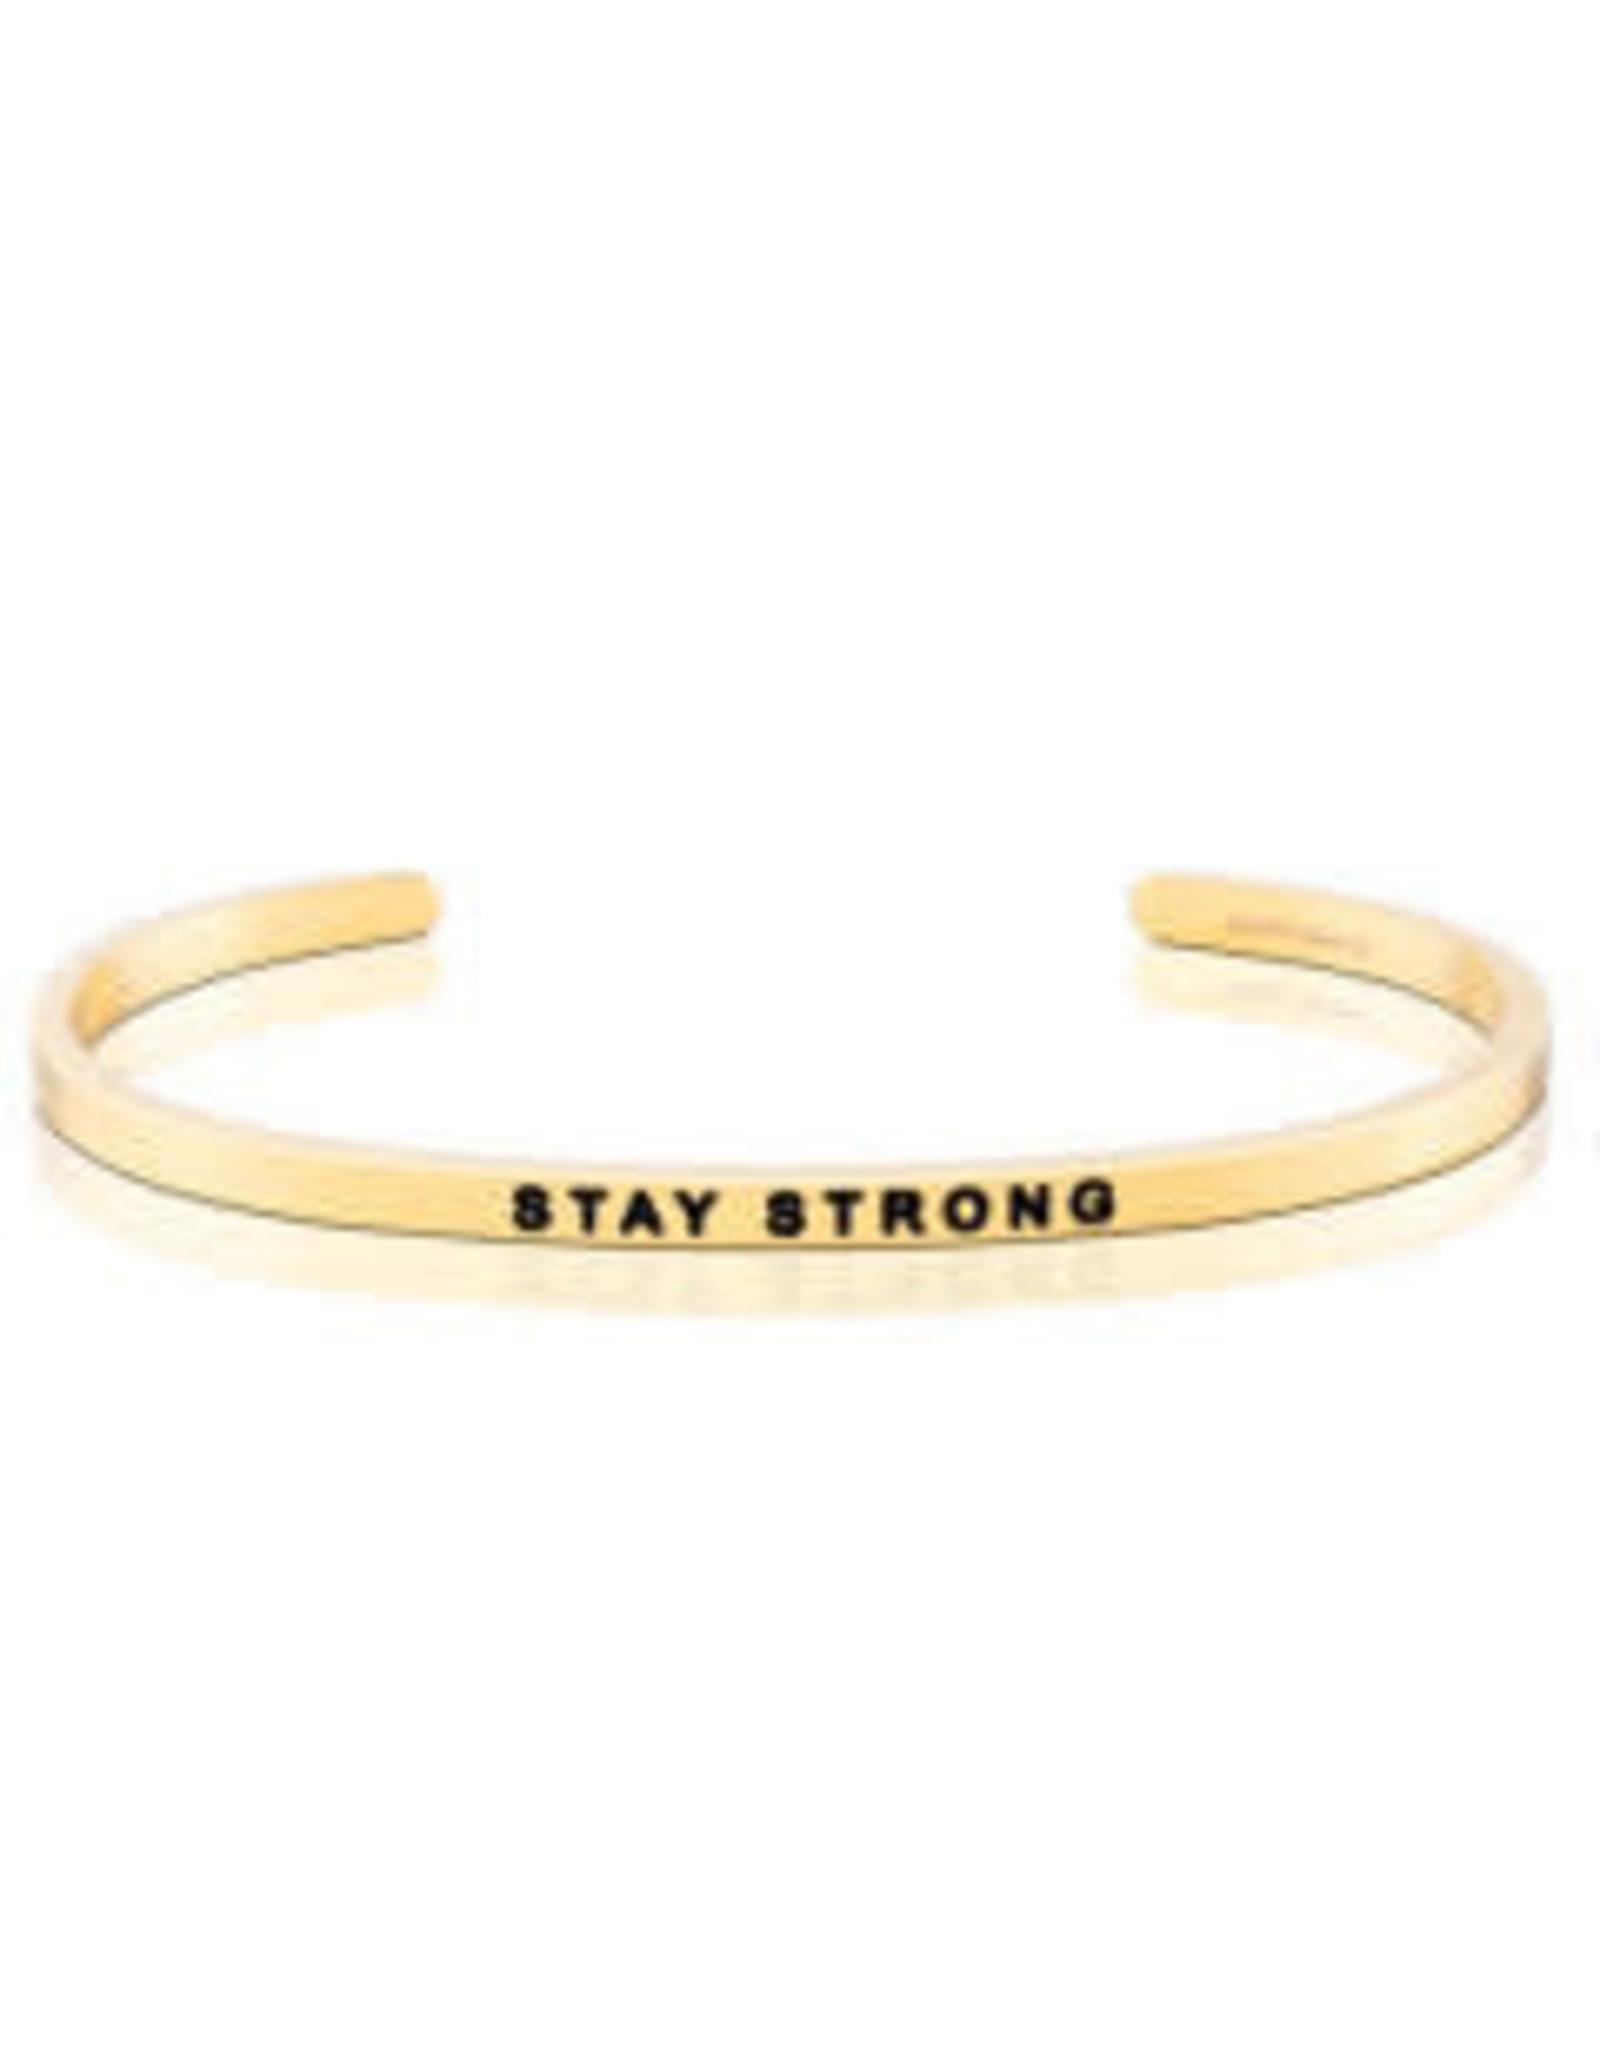 MantraBand MantraBand Bracelet, Stay Strong